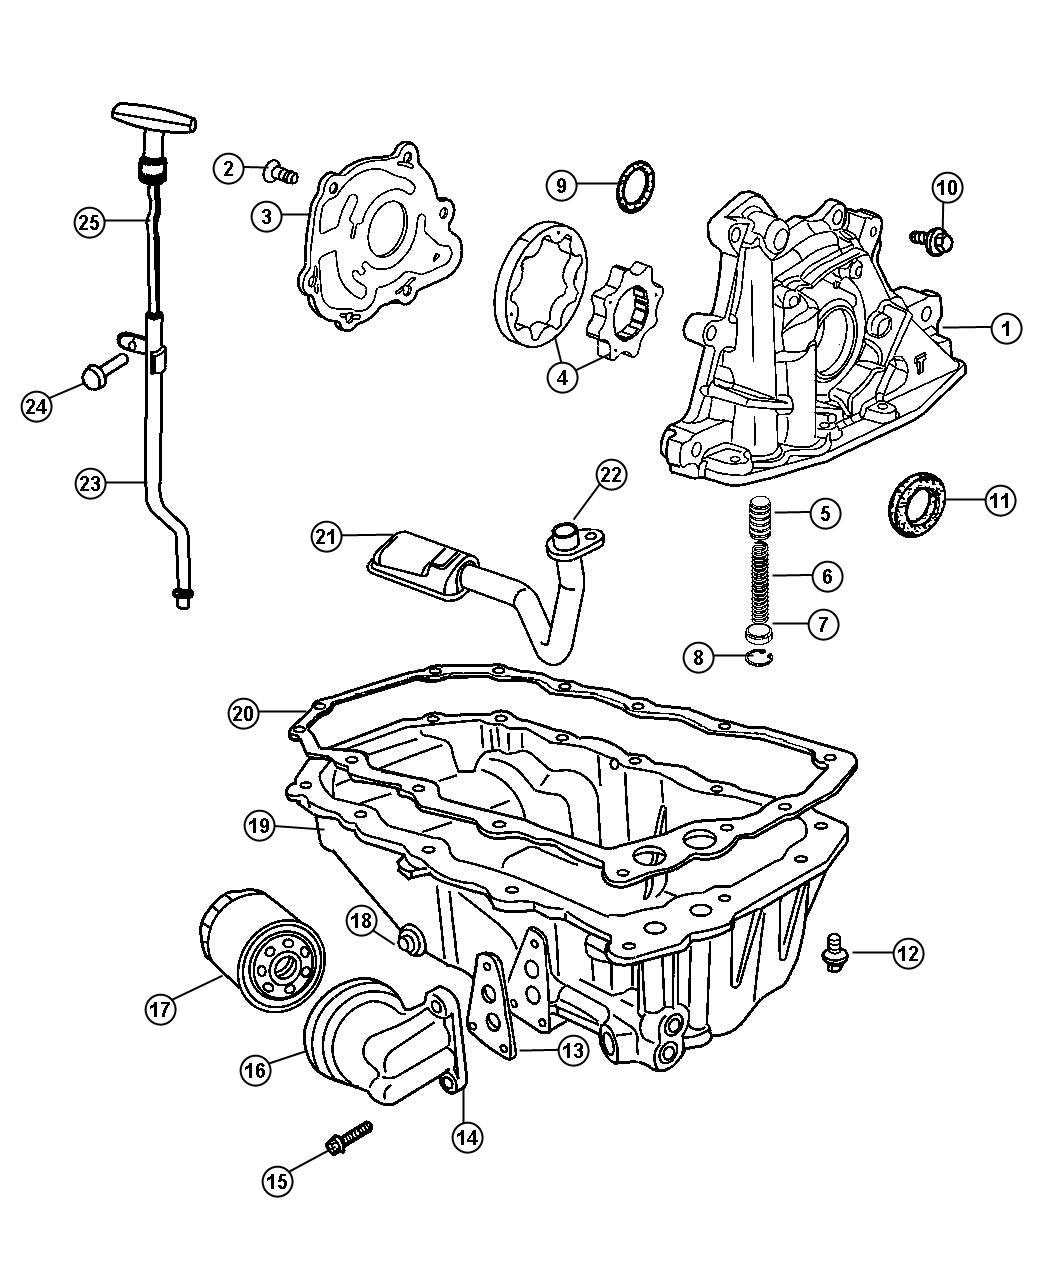 Chrysler 300 Pump Engine Oil Plunger Pconsists Edtedv